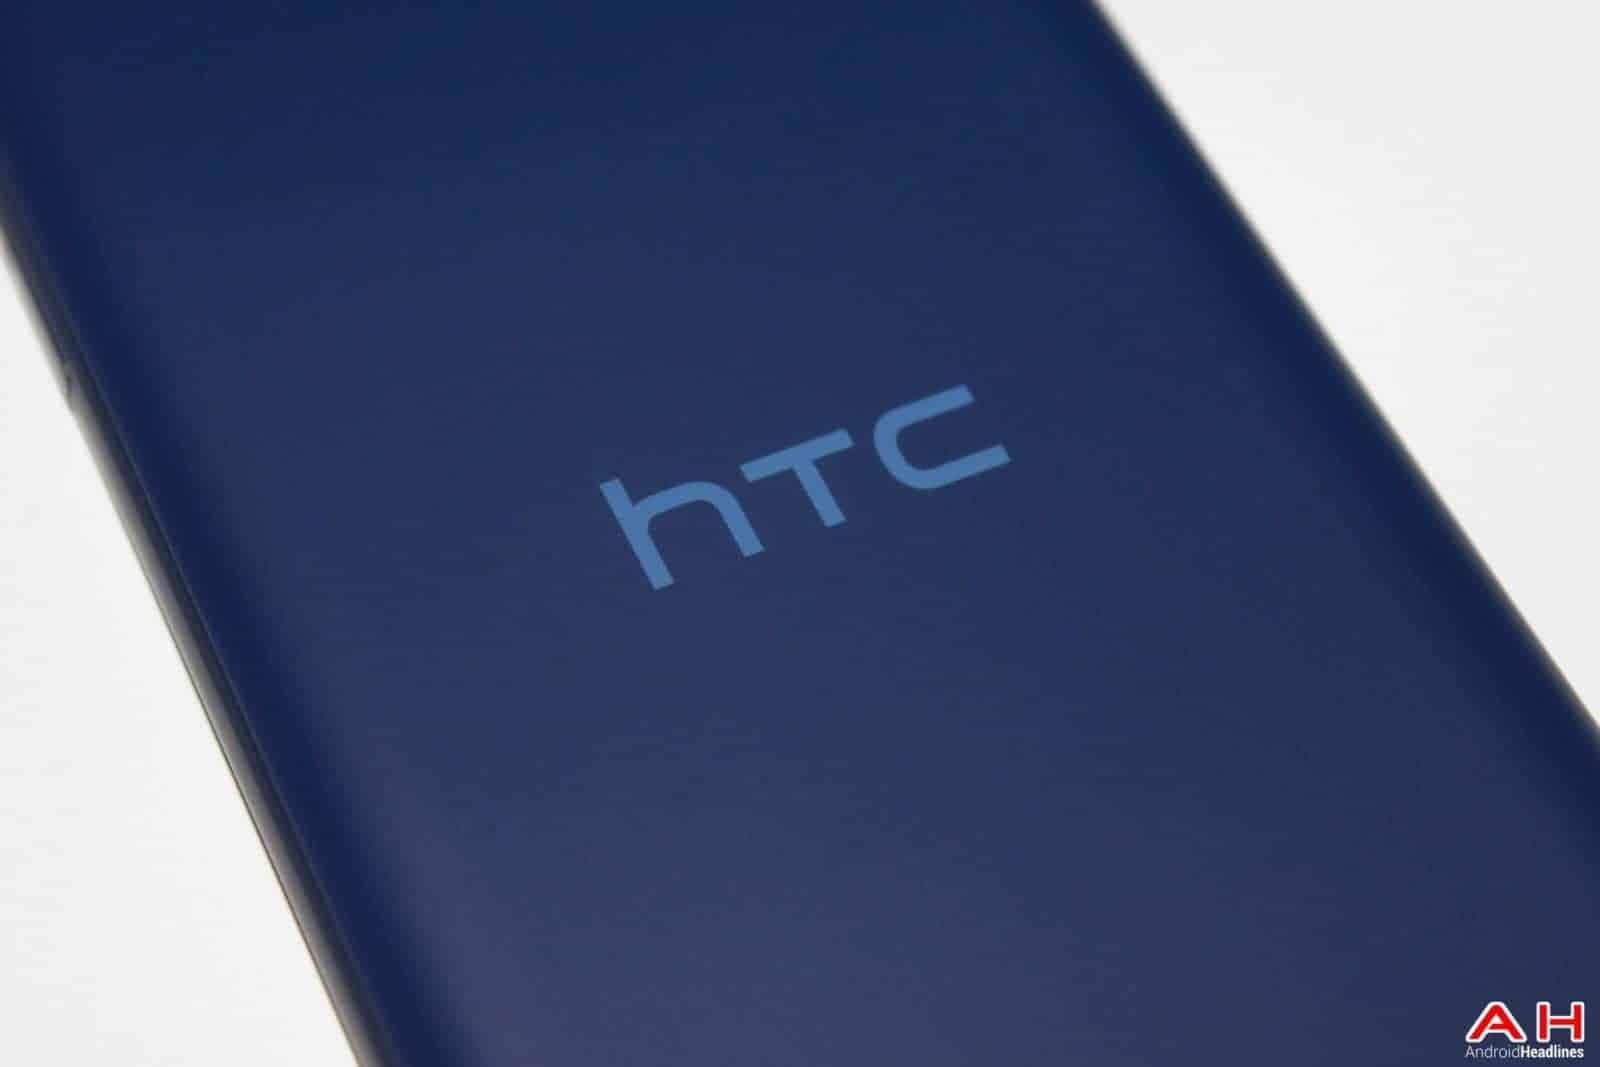 AH HTC DESIRE 510 -4 LOGO